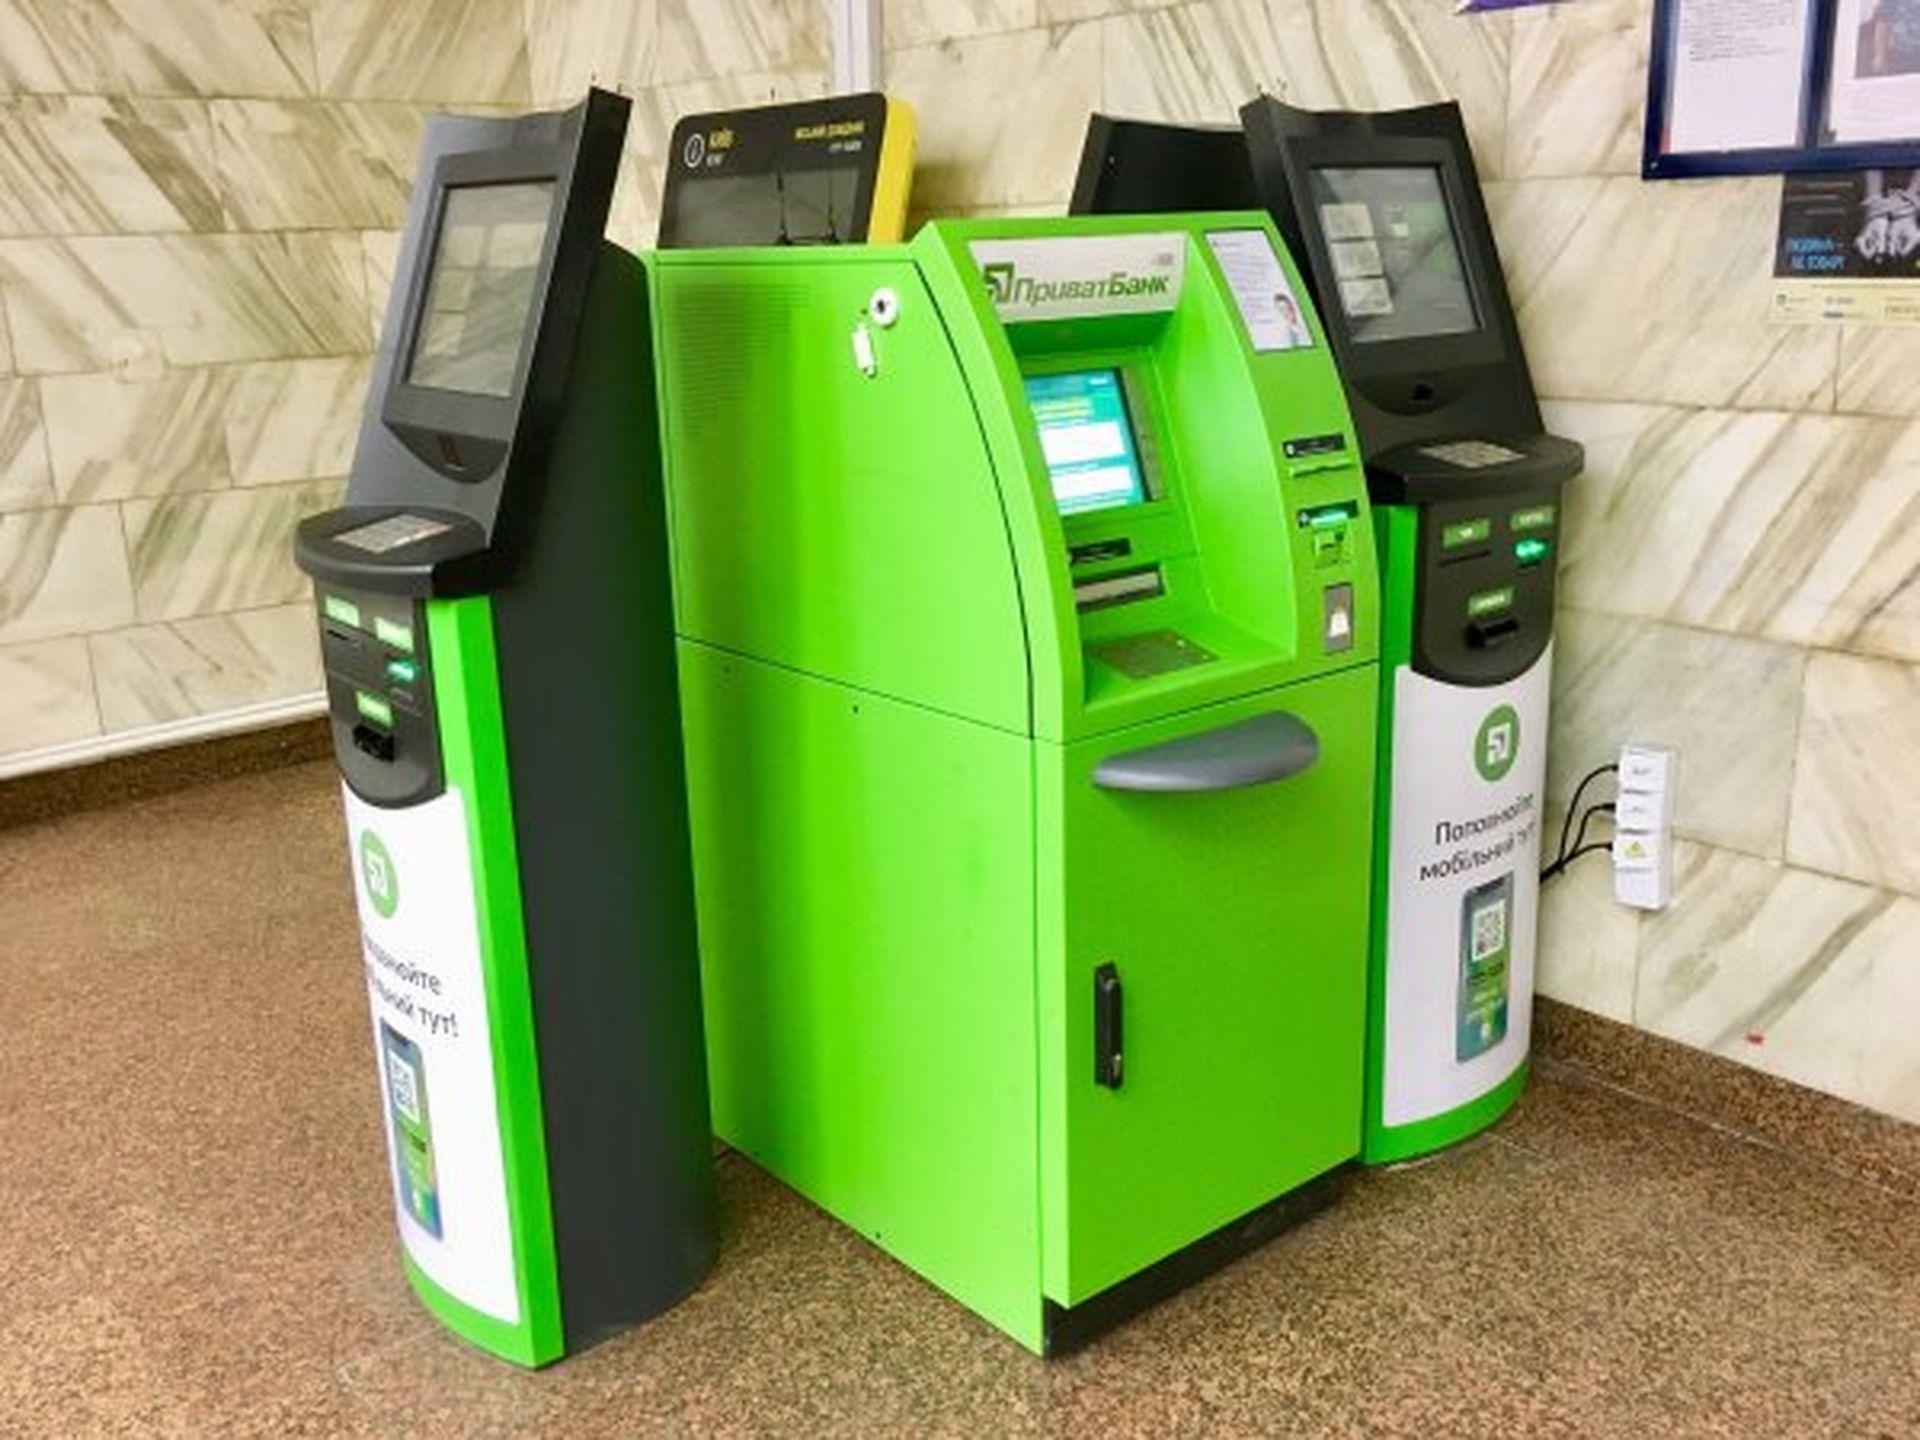 Do stolyčnogo metropolitenu povernuly bankomaty